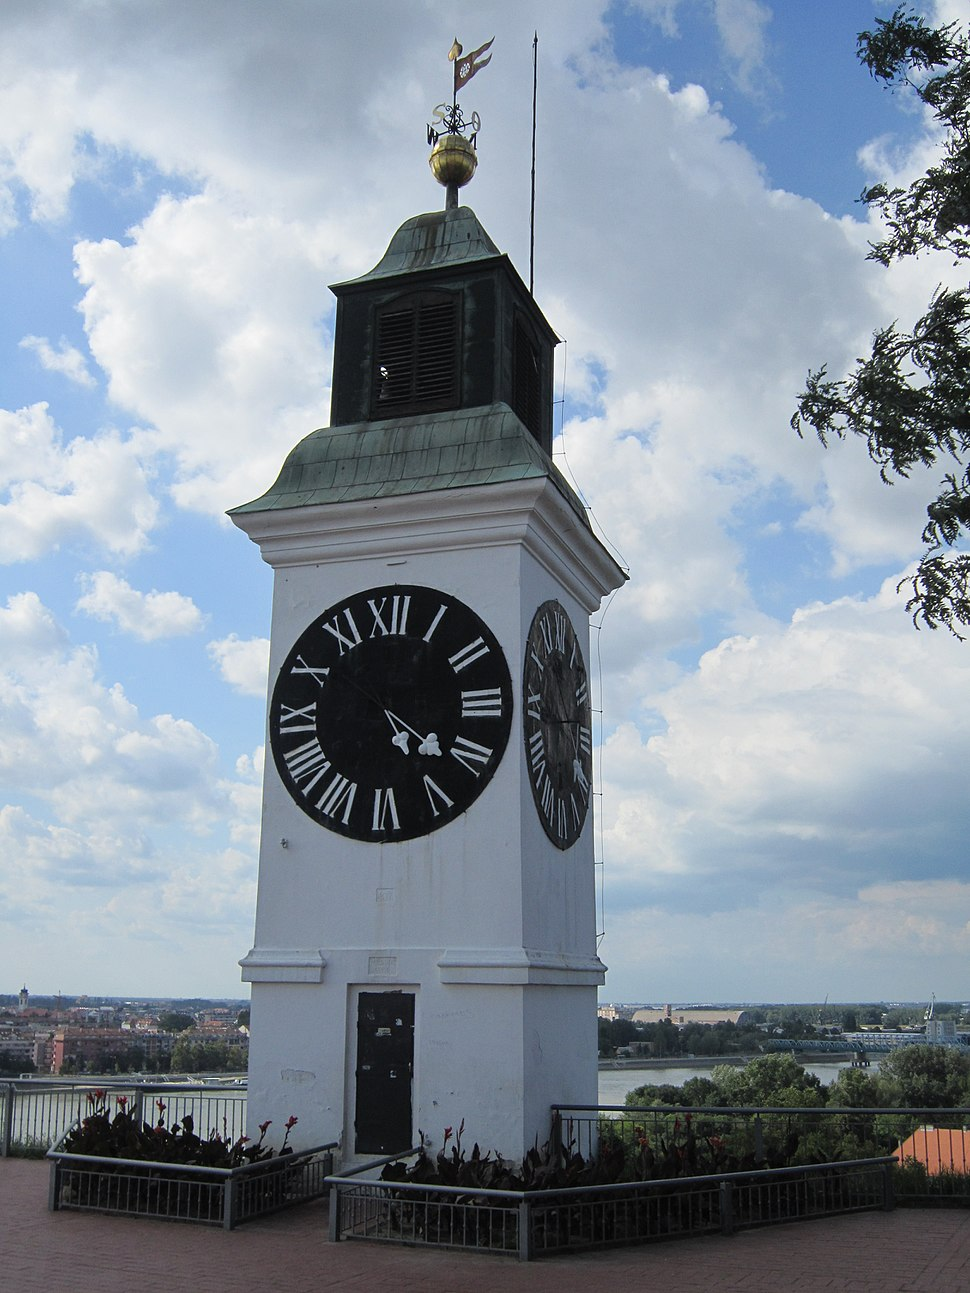 Serbia - Petrovaradin - clock tower